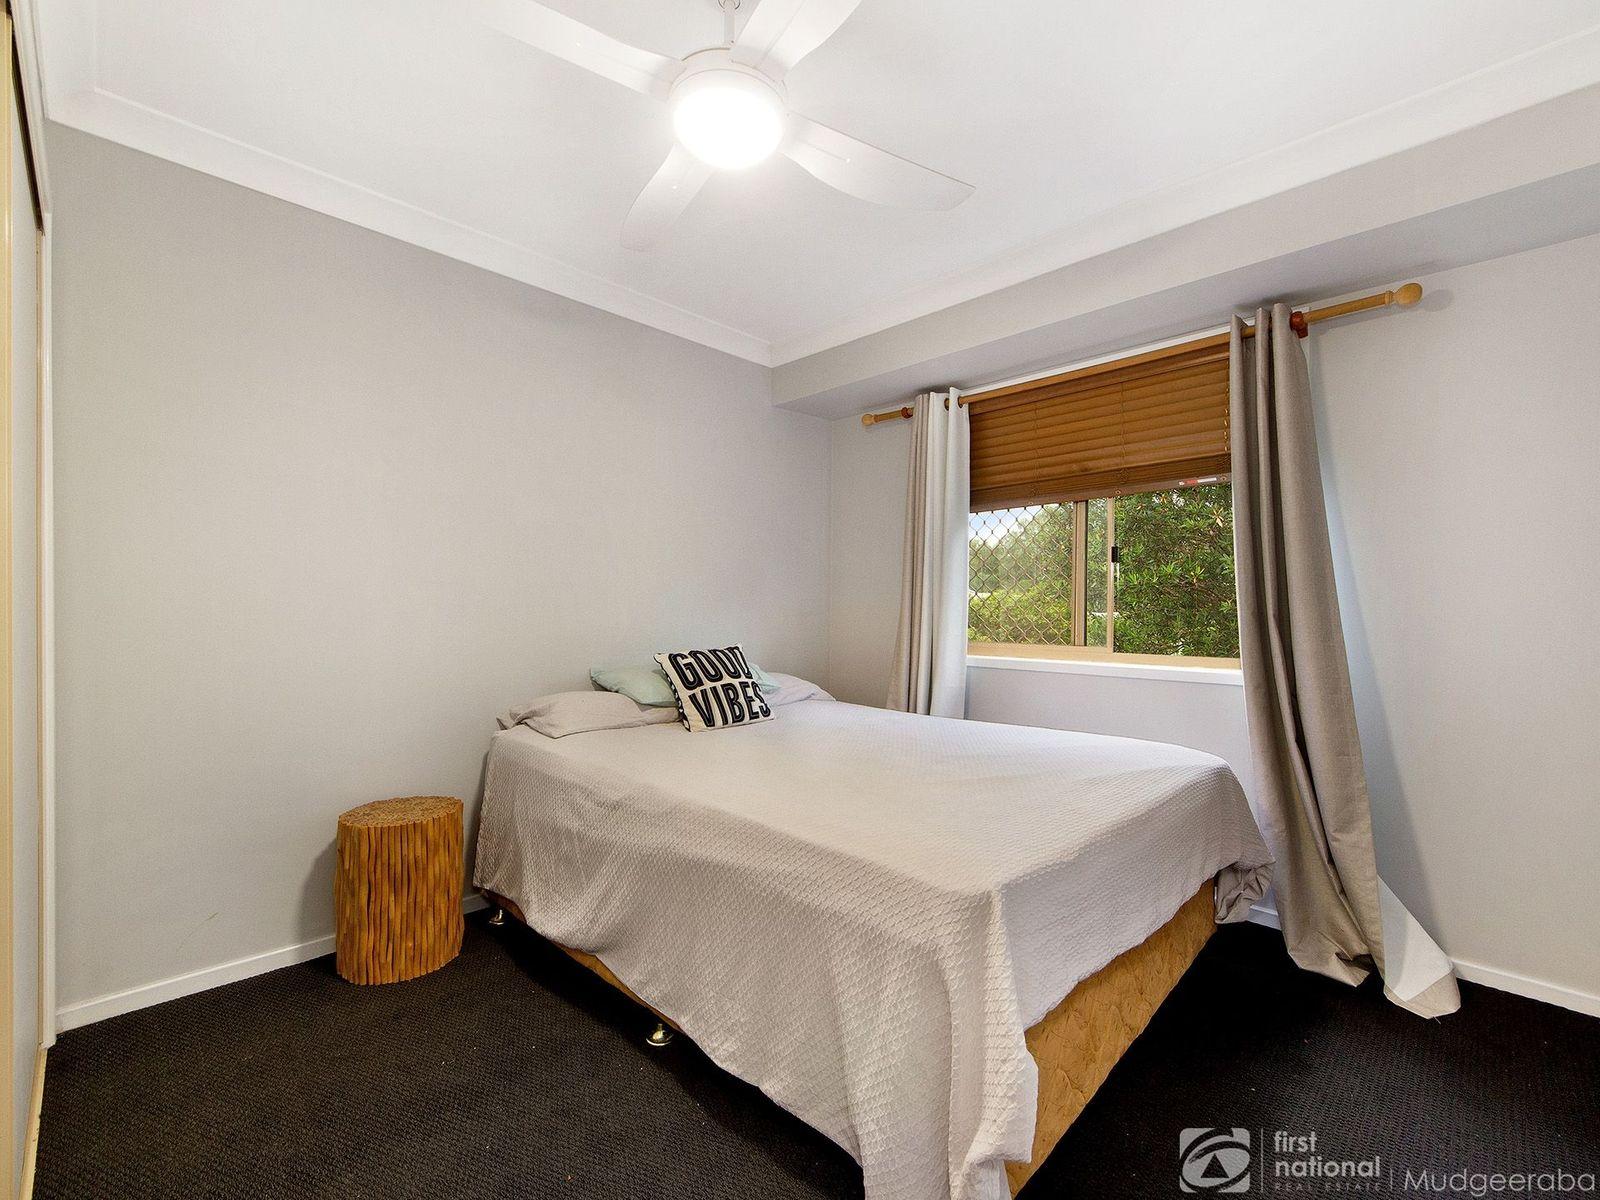 30/14 Bourton Road, Merrimac, QLD 4226